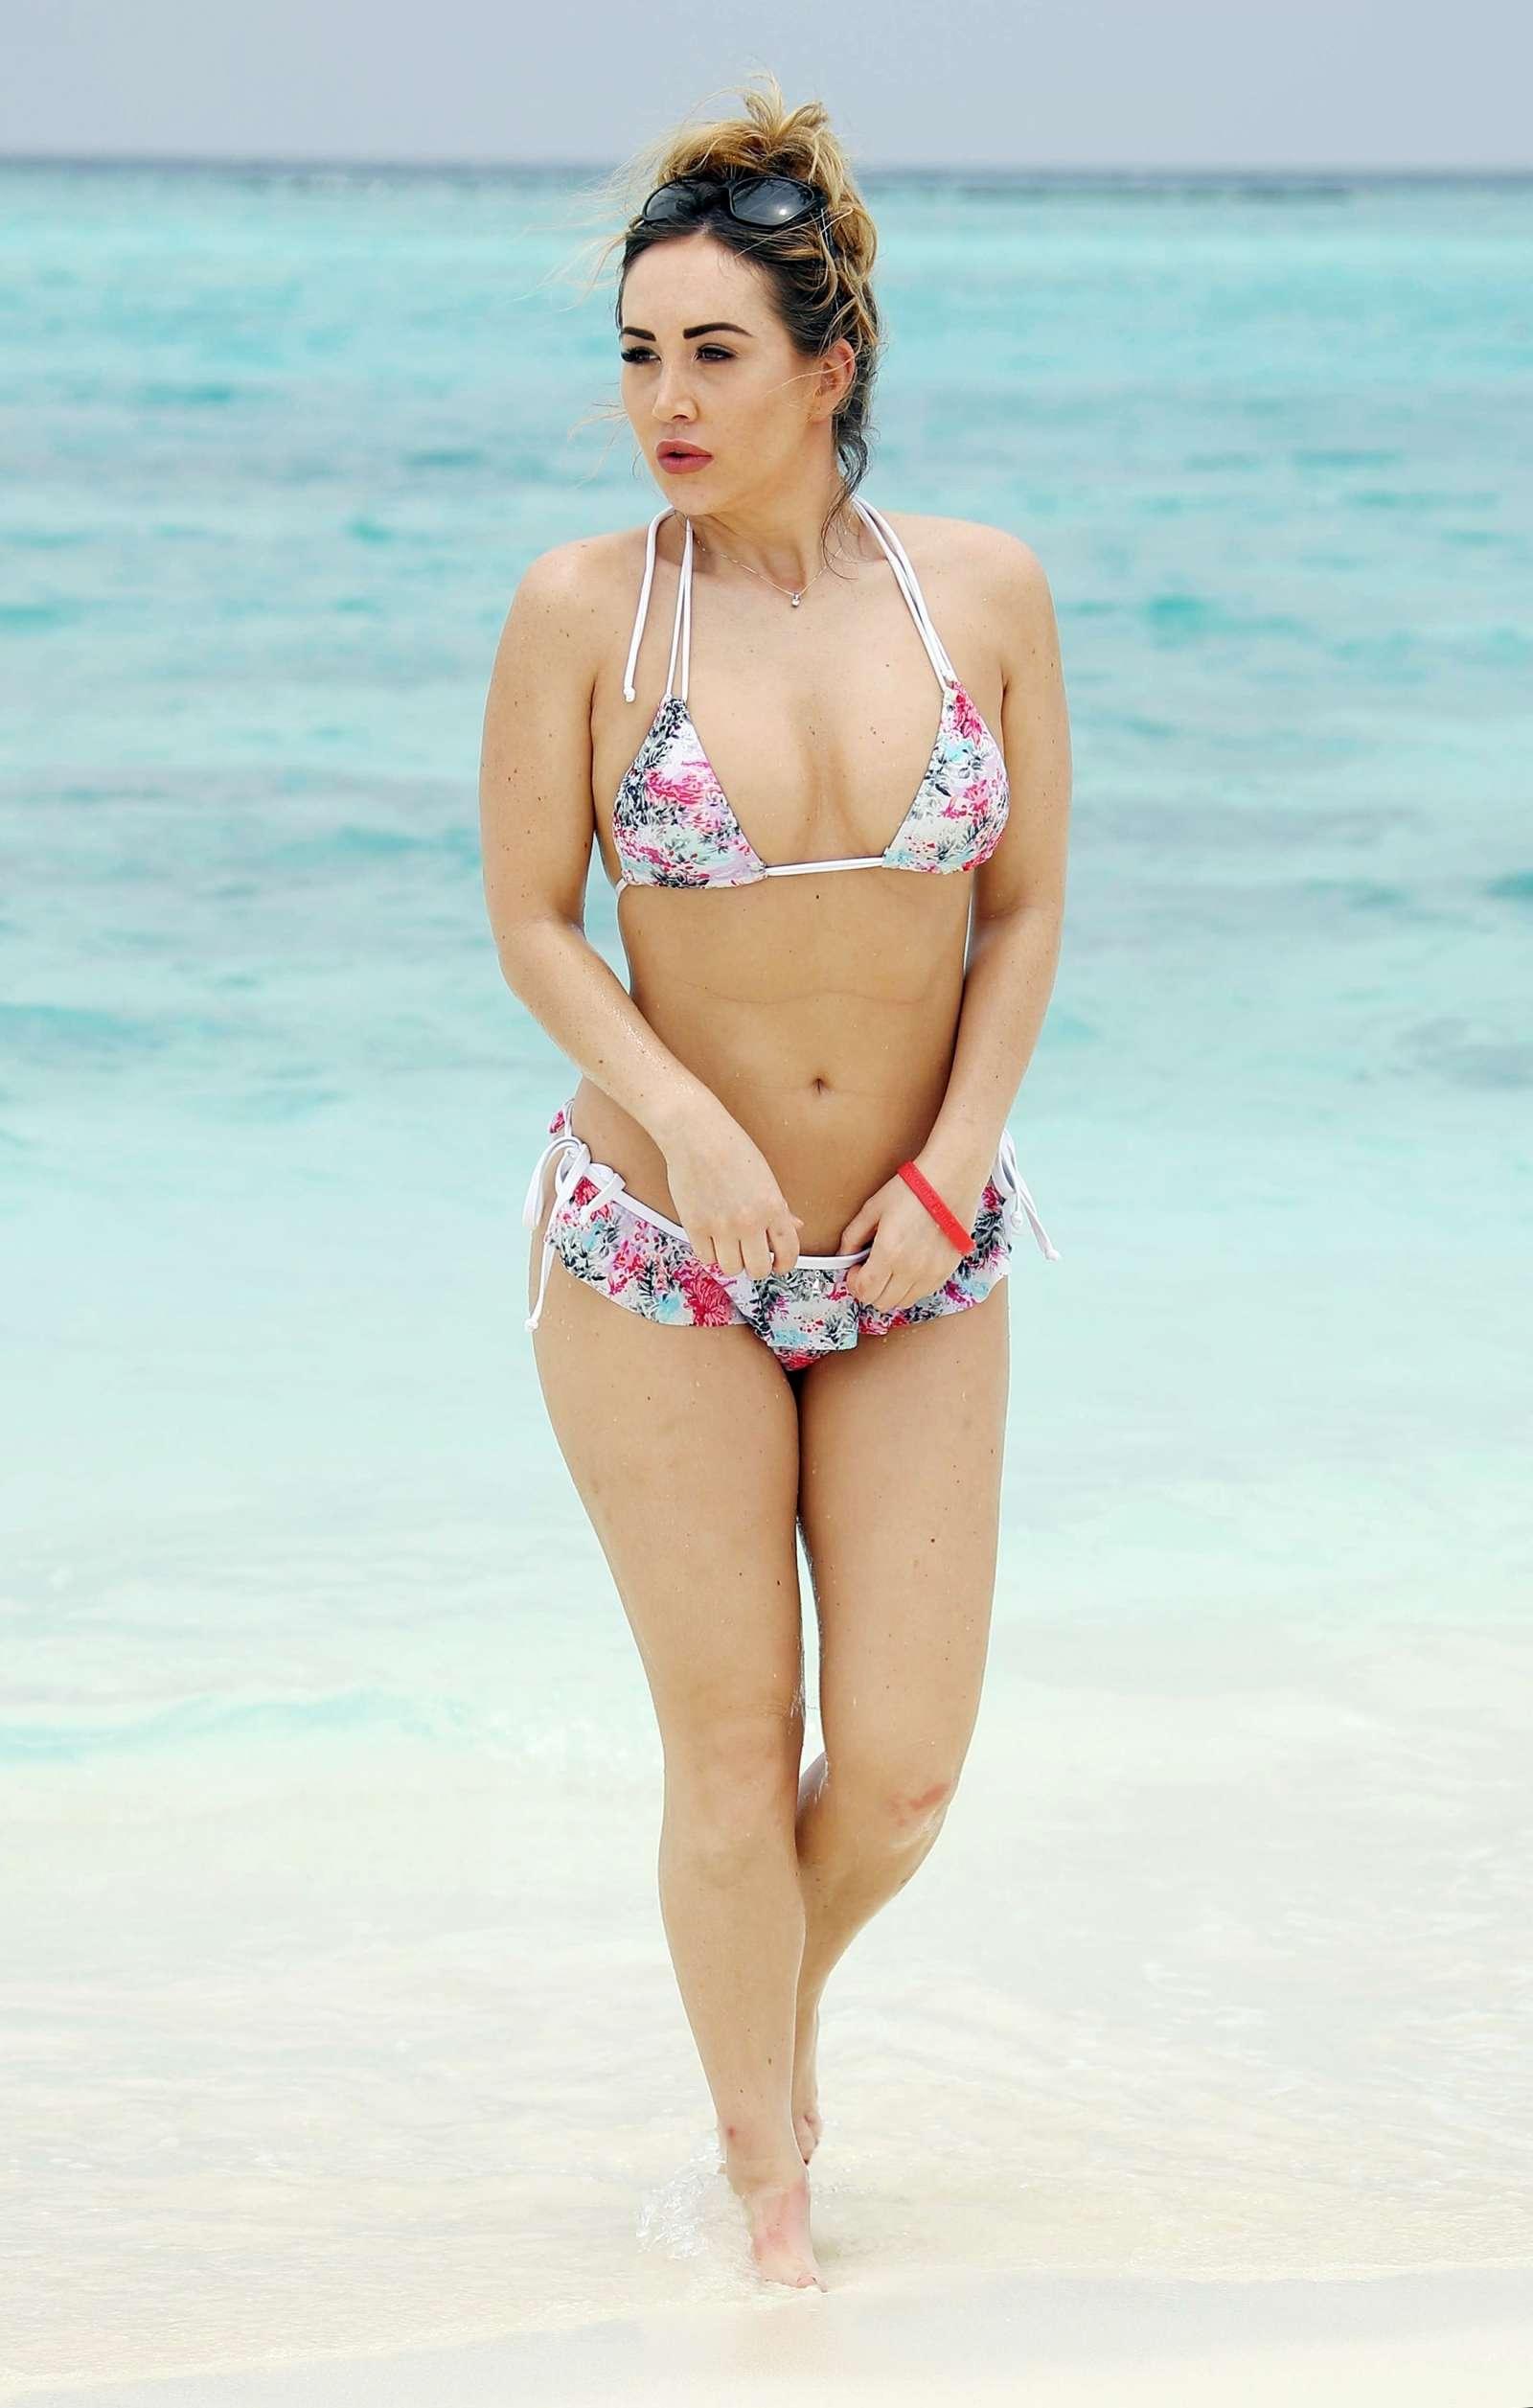 Bikini Lauryn Goodman naked (43 photo), Topless, Hot, Feet, swimsuit 2019